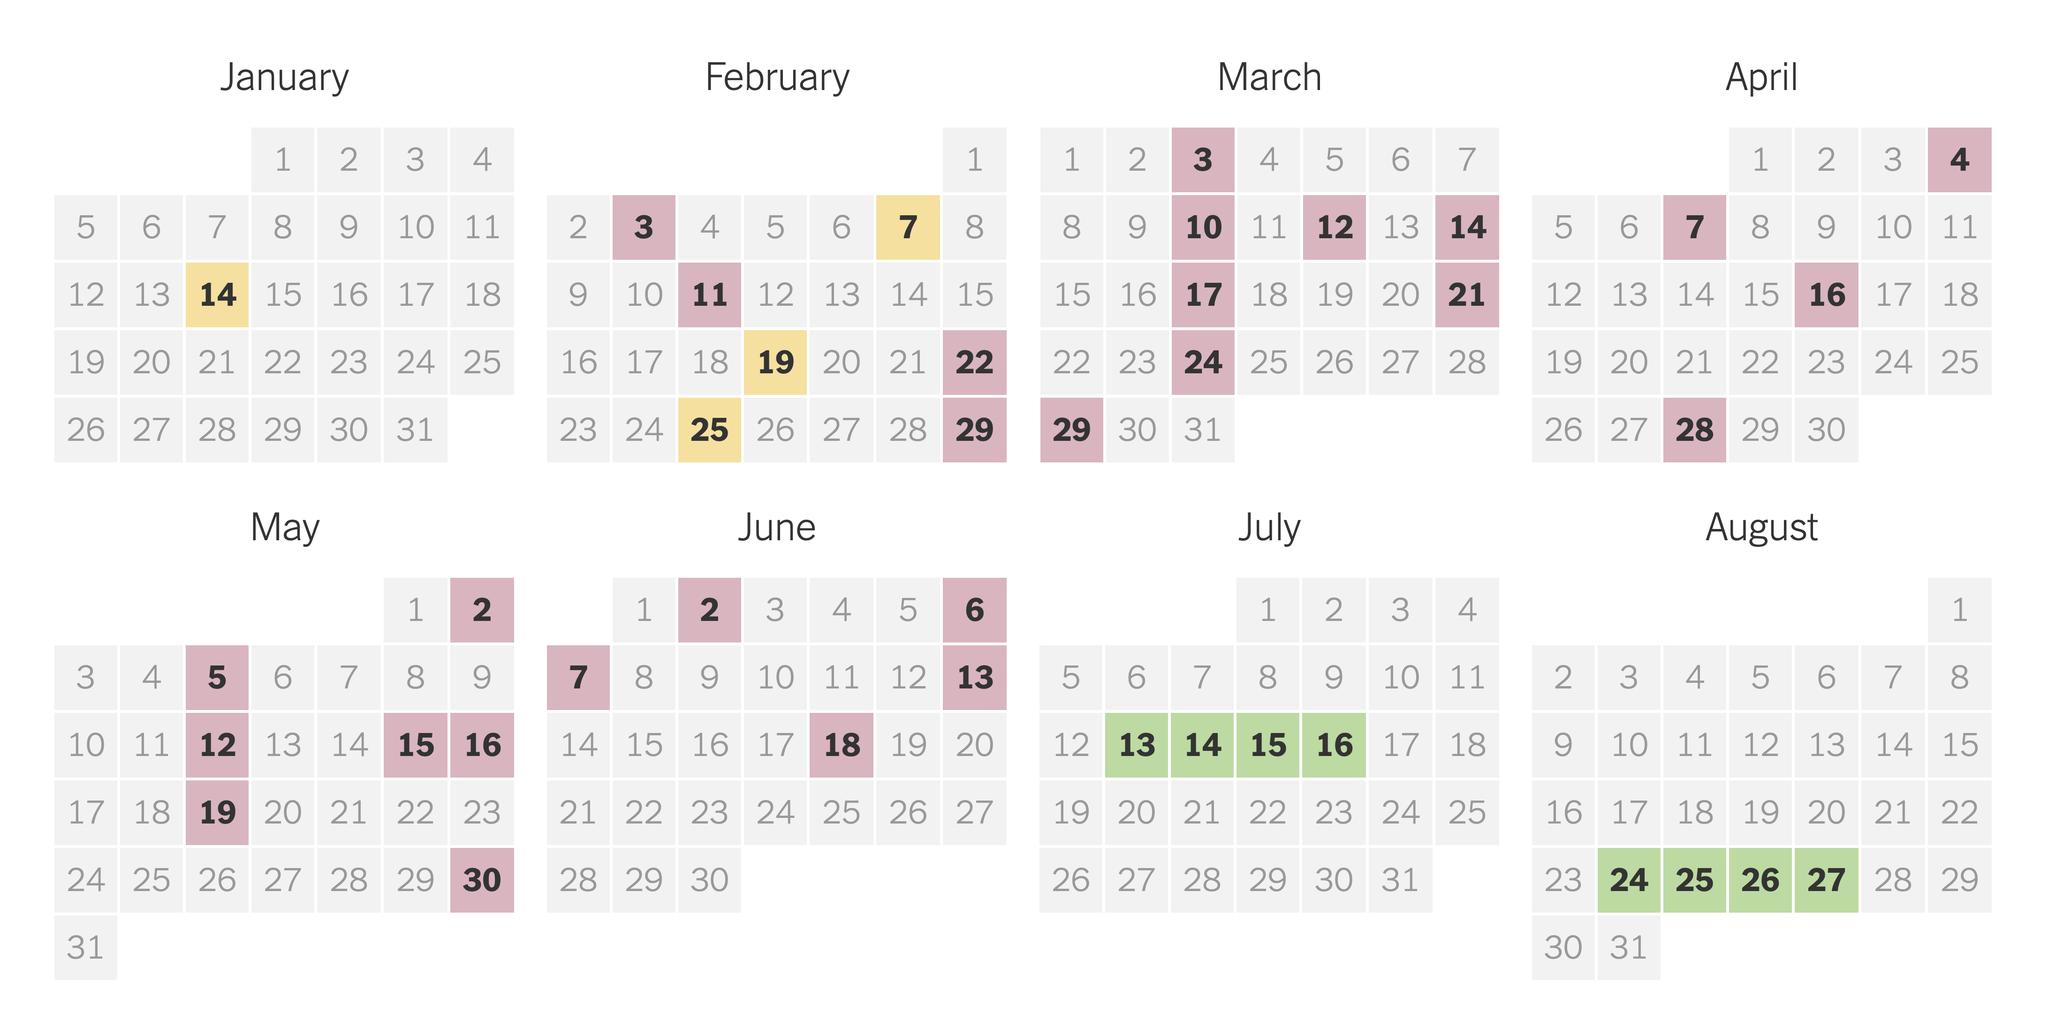 2020 Presidential Primary Election Calendar - The New York Times Regarding University Of Rhosde Island Calendar 20 21